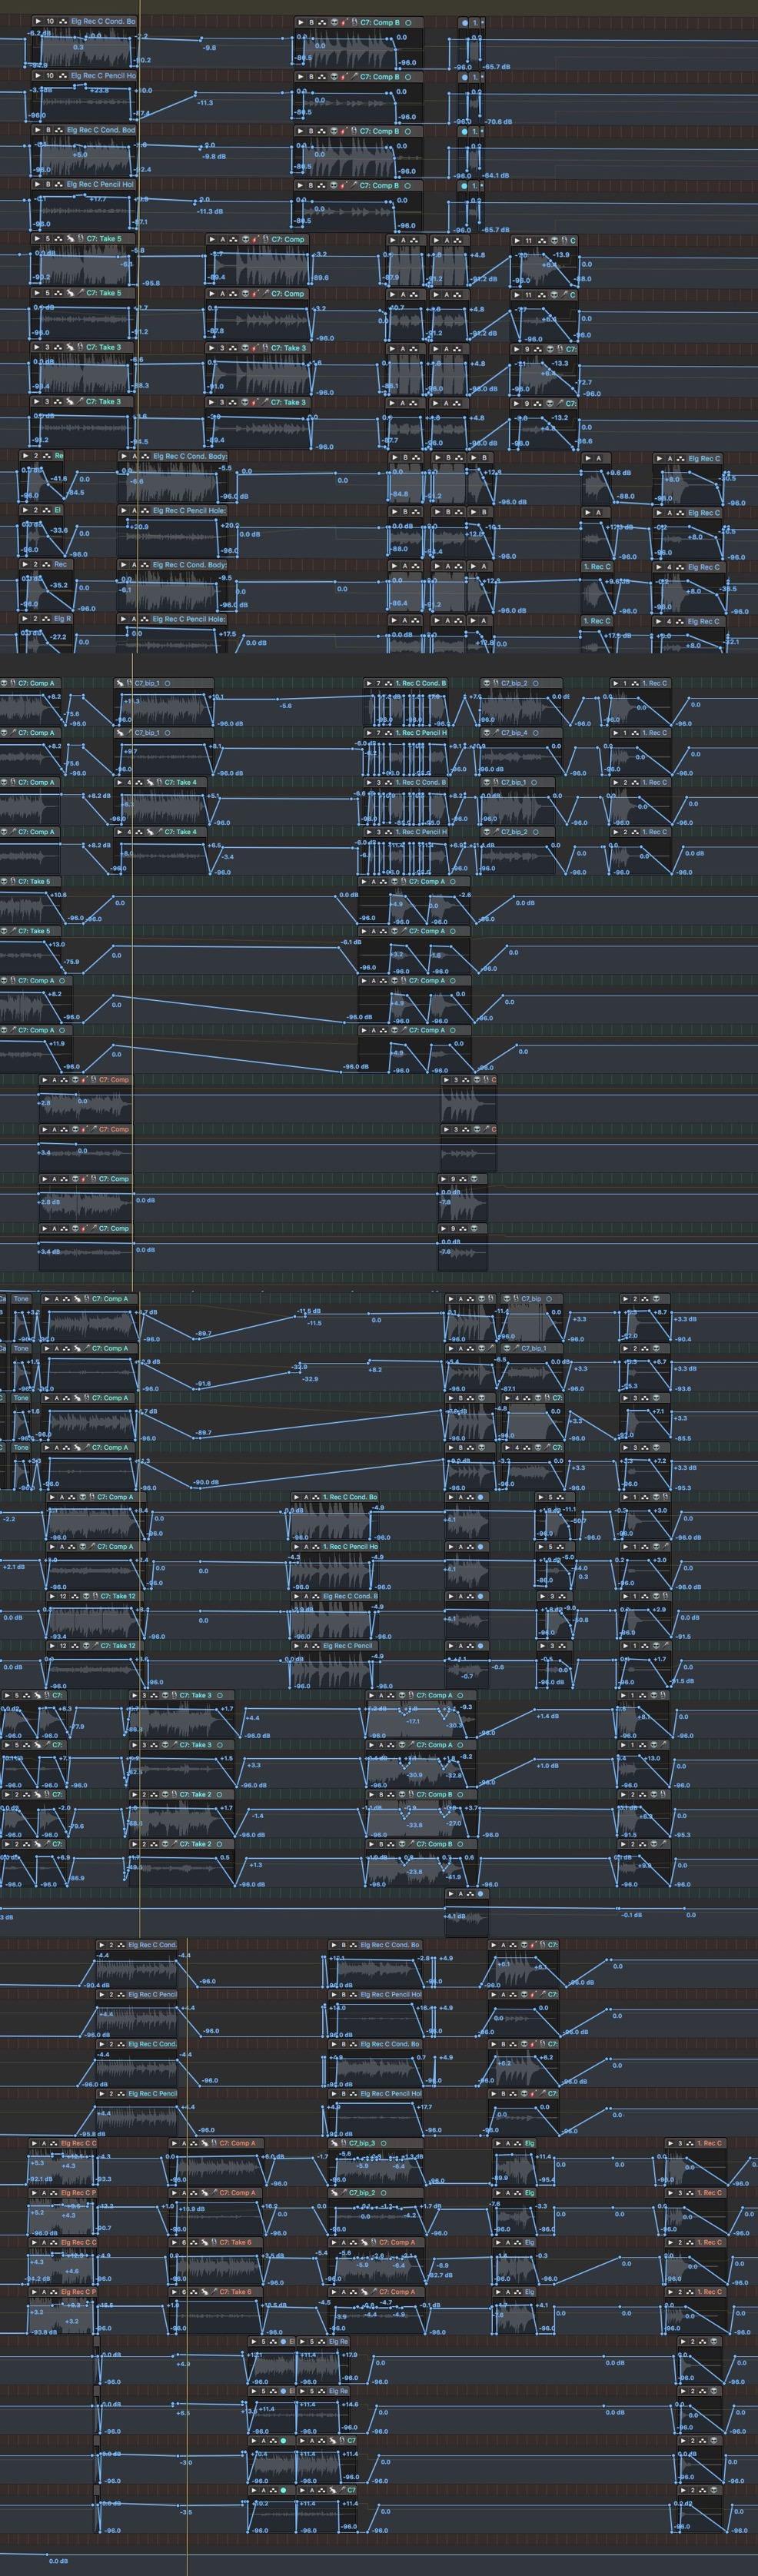 RoR-Automated.jpg